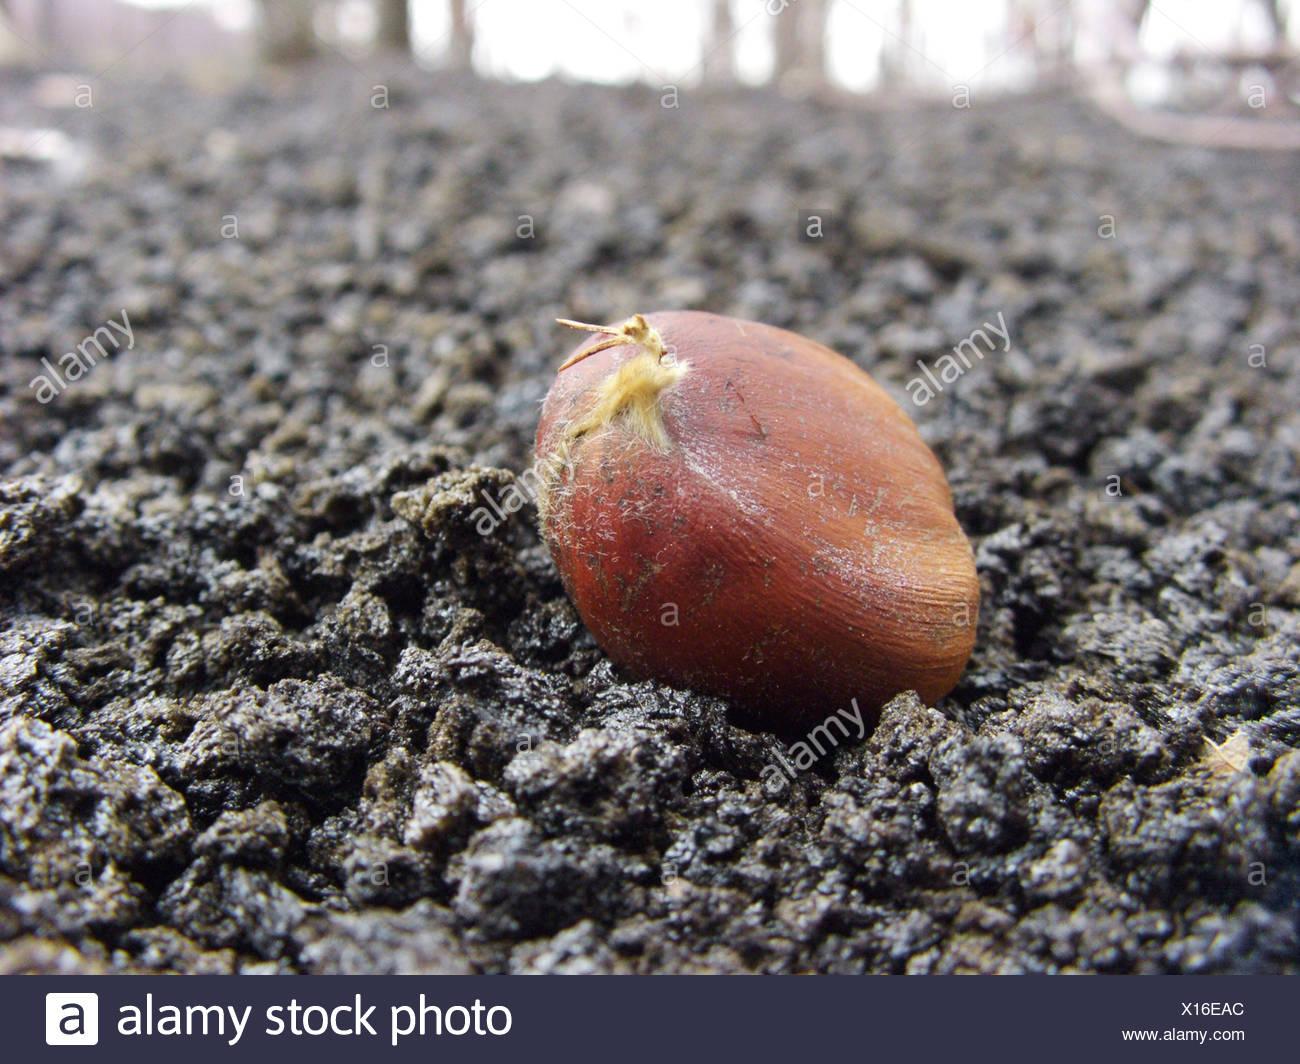 Spanish chestnut, sweet chestnut (Castanea sativa), chestnut on a lava field at the northern slope of Mount Etna, Italy, Sicilia - Stock Image